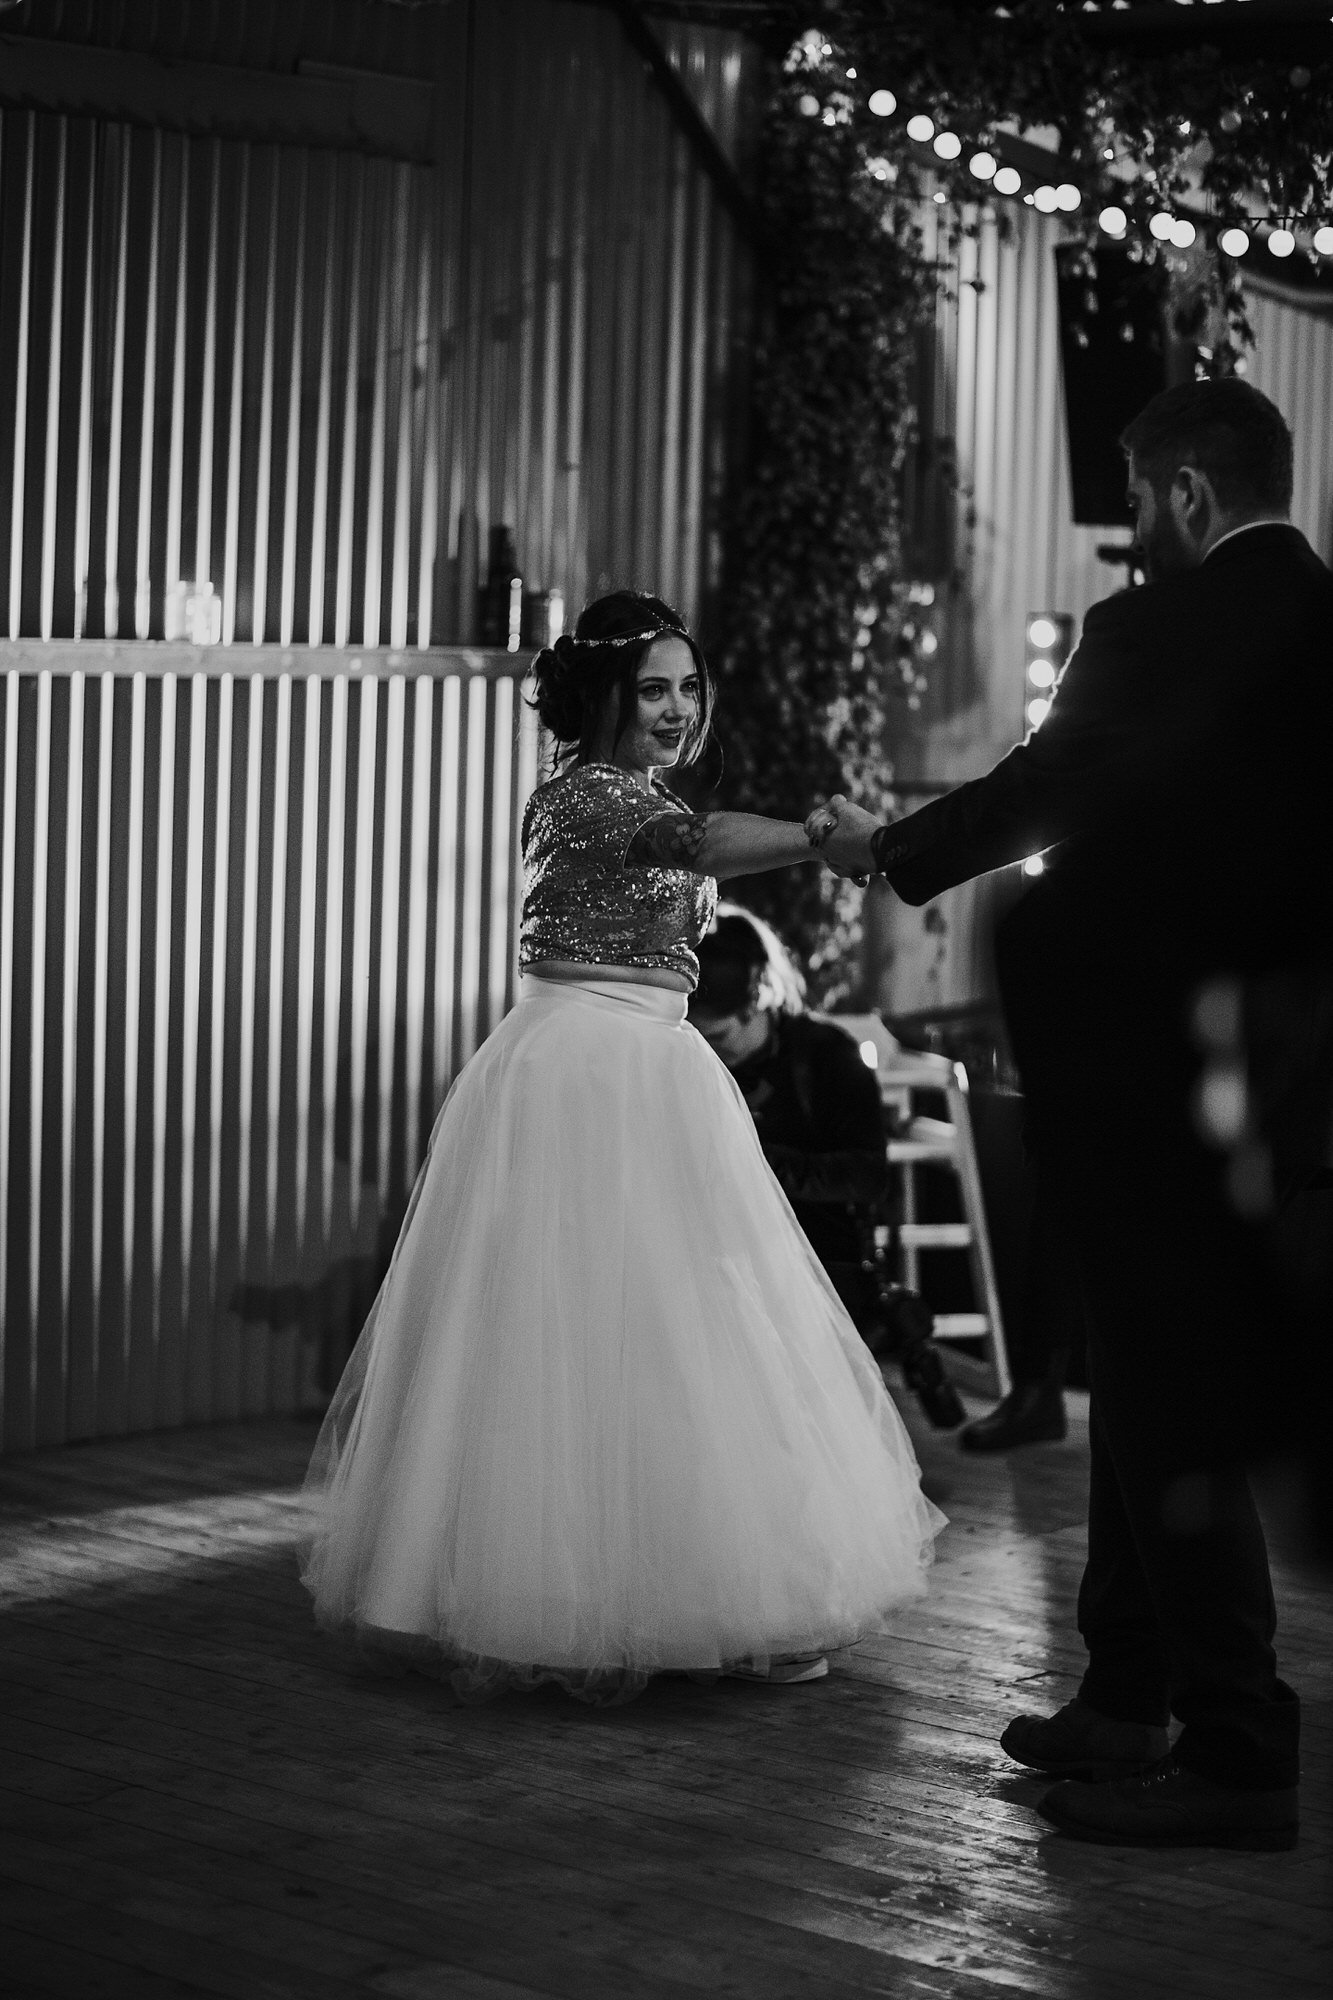 076 TIN SHED KNOCKRAICH FARM WEDDING ALTERNATIVE BRIDE ZOE ALEXANDRA PHOTOGRAPHY